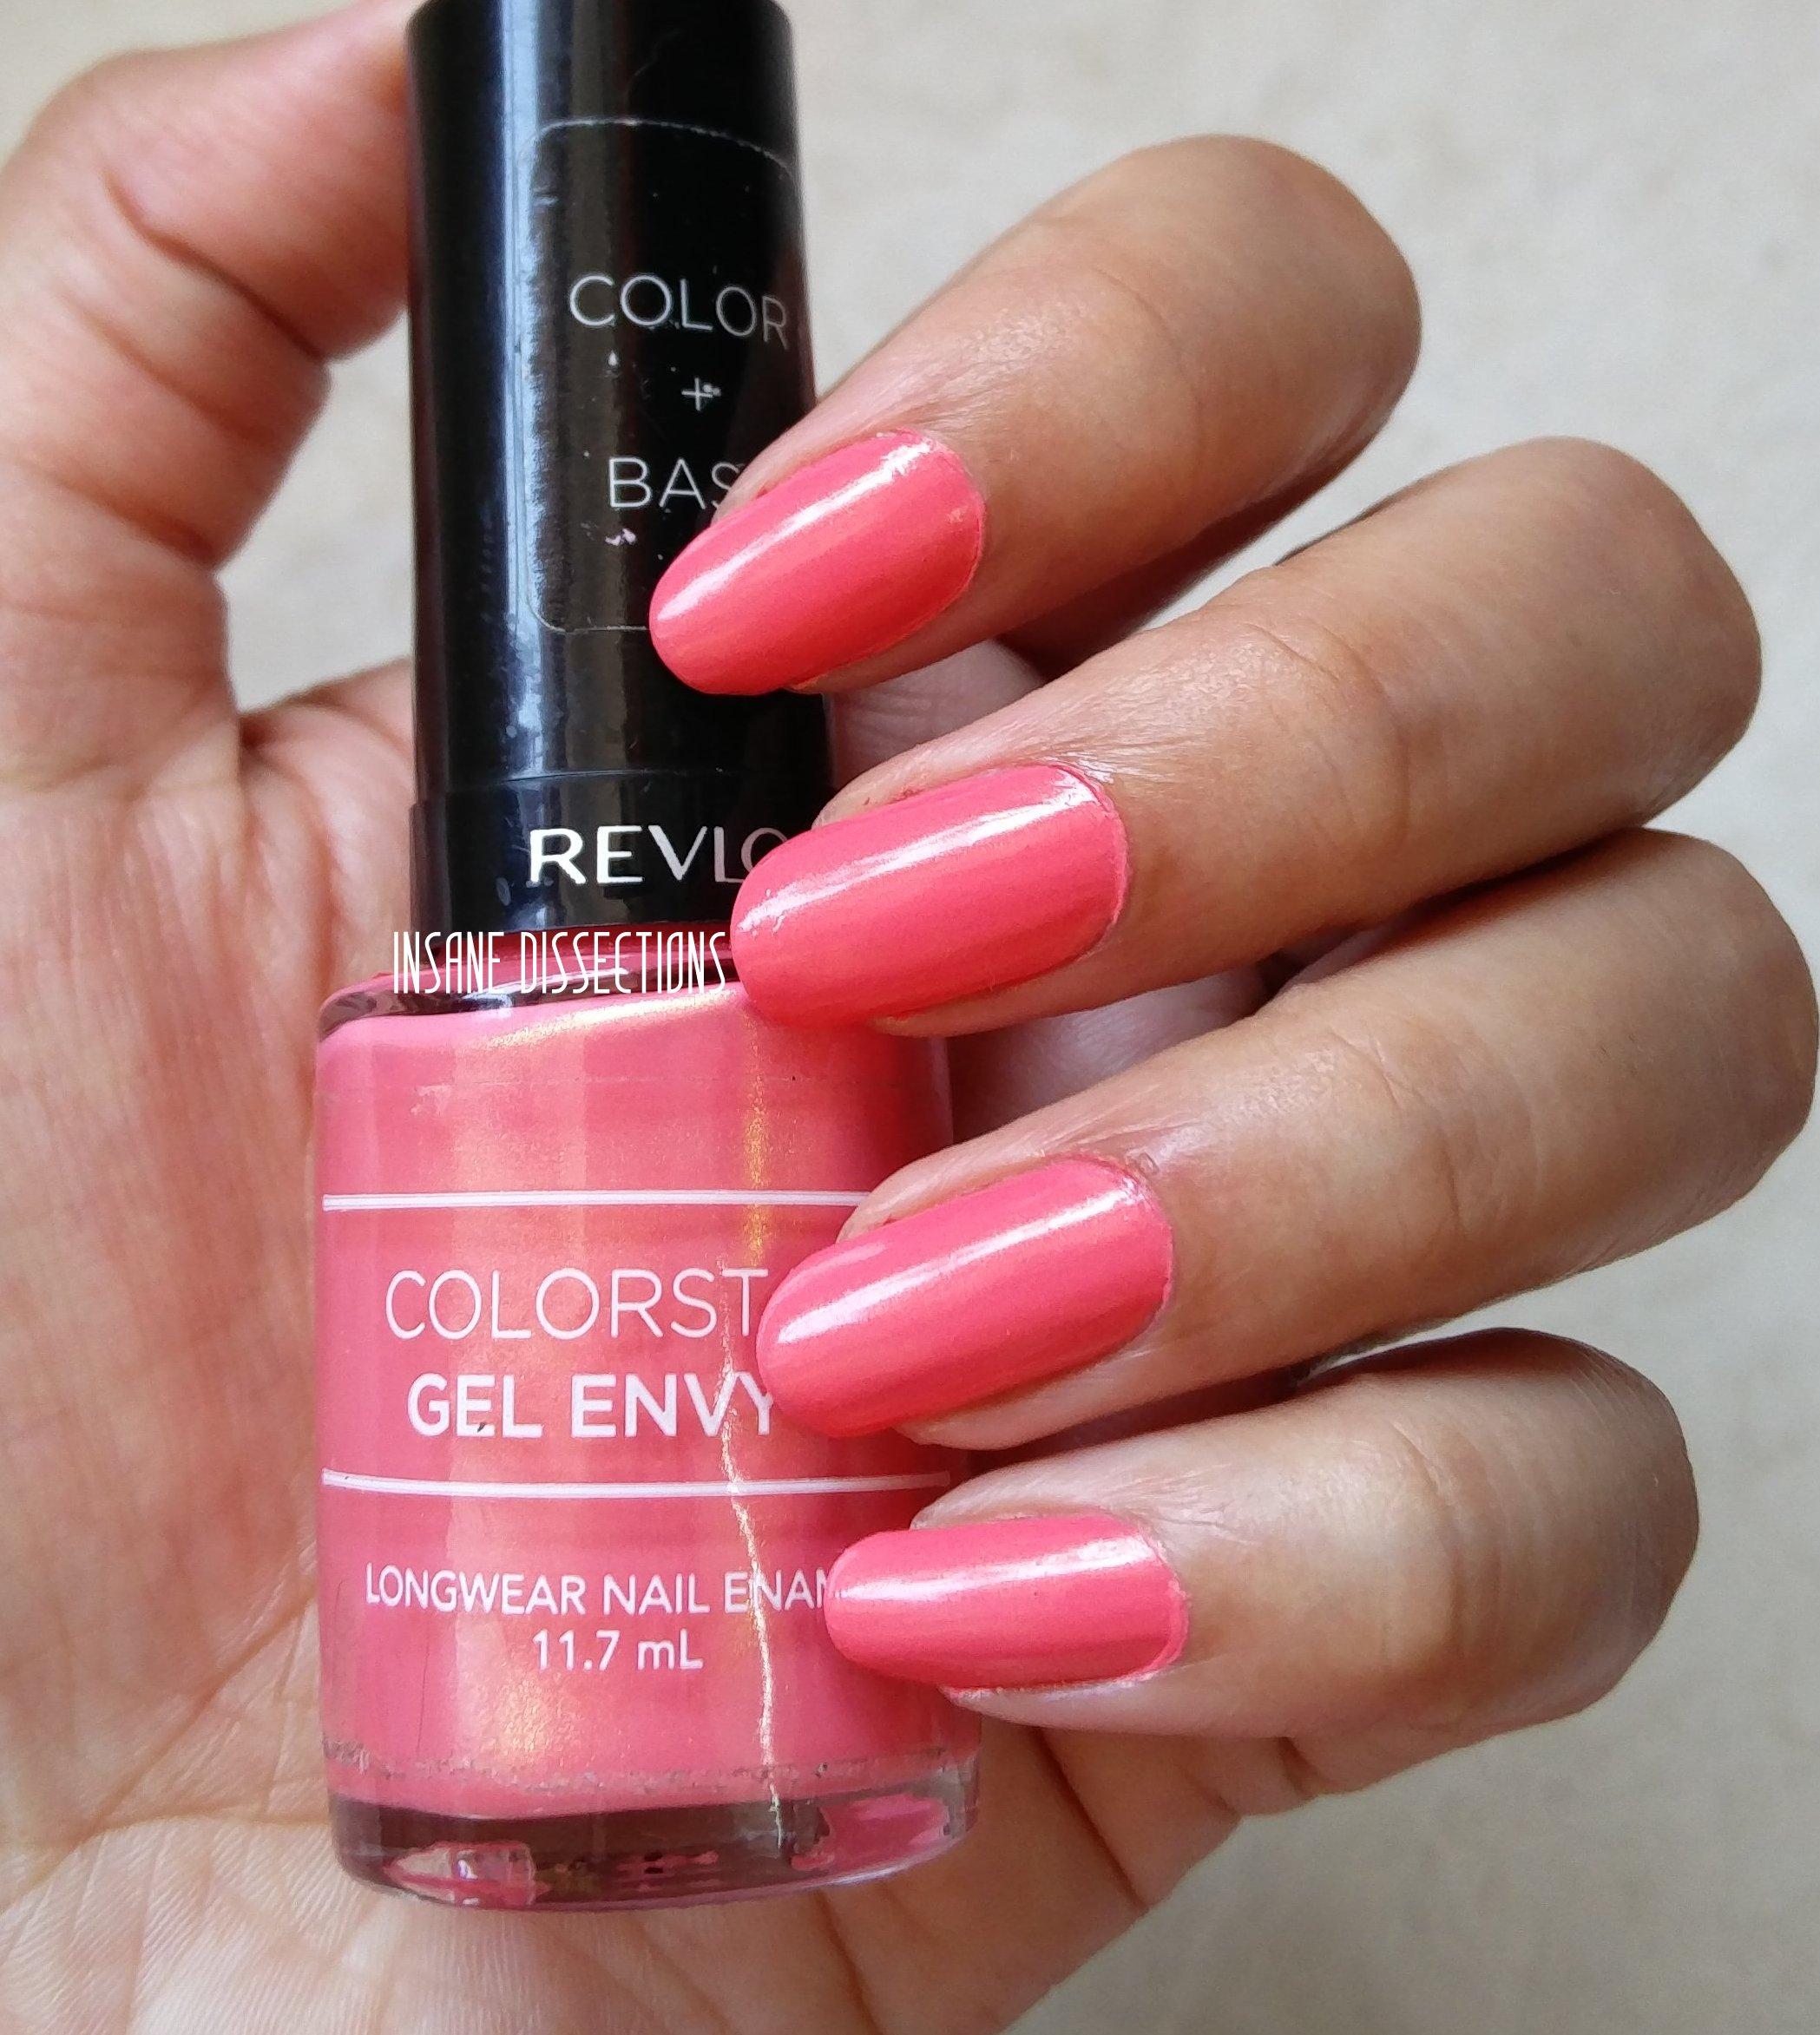 revlon colorstay gel envy lady luck nailpolish review